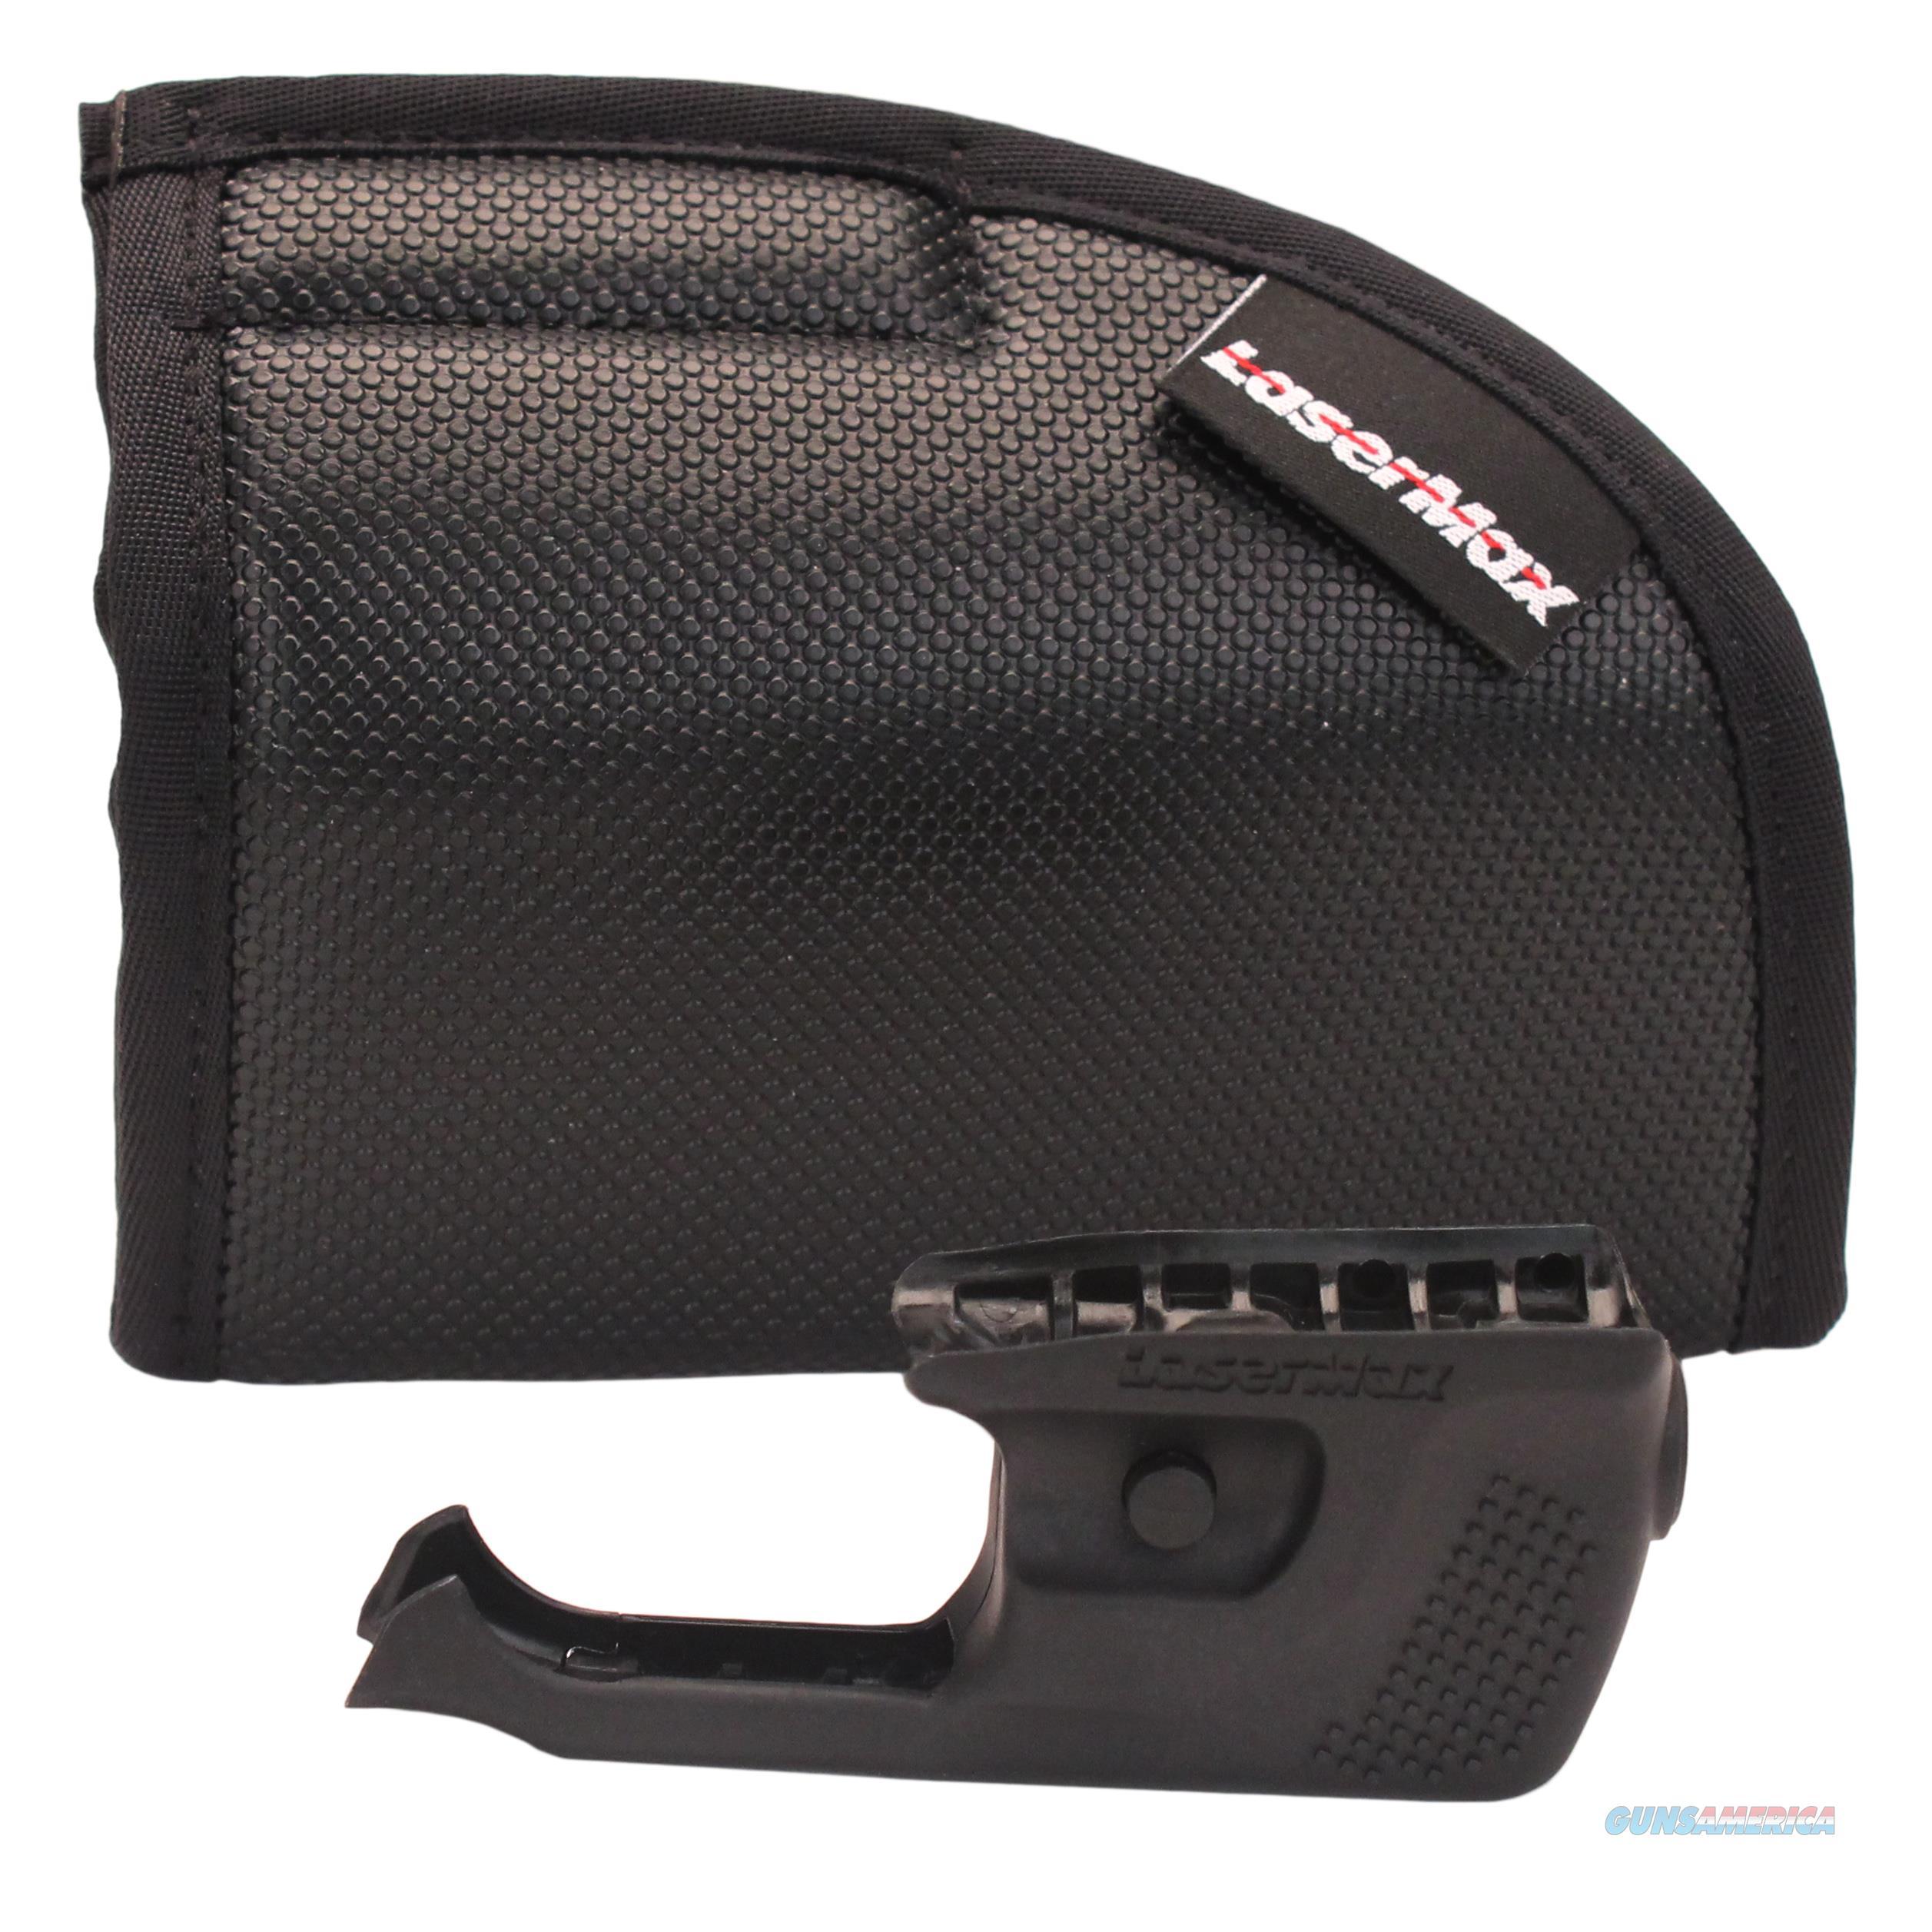 Lasermax Centerfire Laser CF-G42-LC  Non-Guns > Iron/Metal/Peep Sights